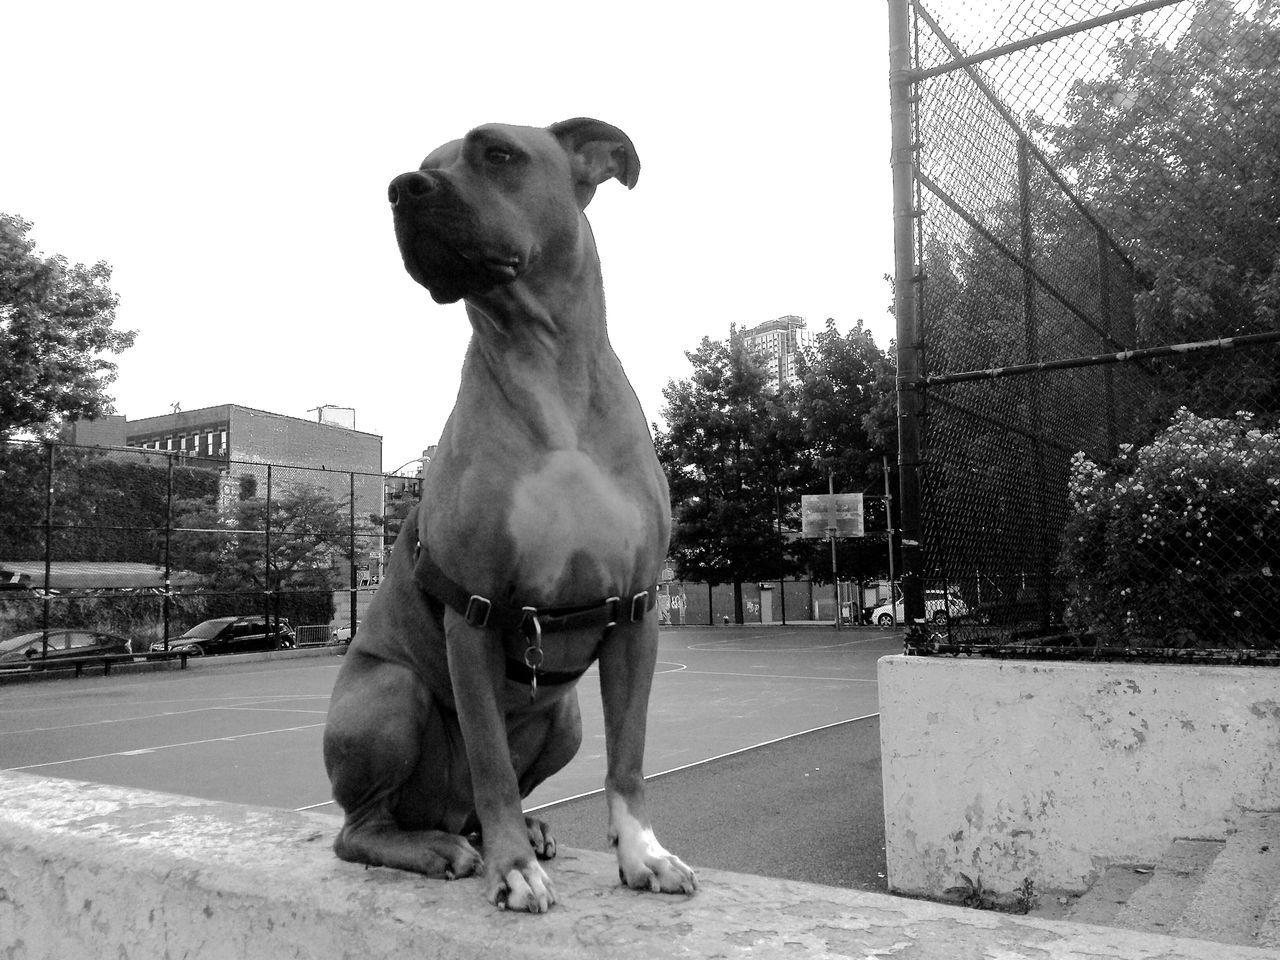 Rufus. Dog. Animal Head  Animal Themes Dog Domestic Animals Looking At Camera No People Pets Pitbull Pitbulls Portrait